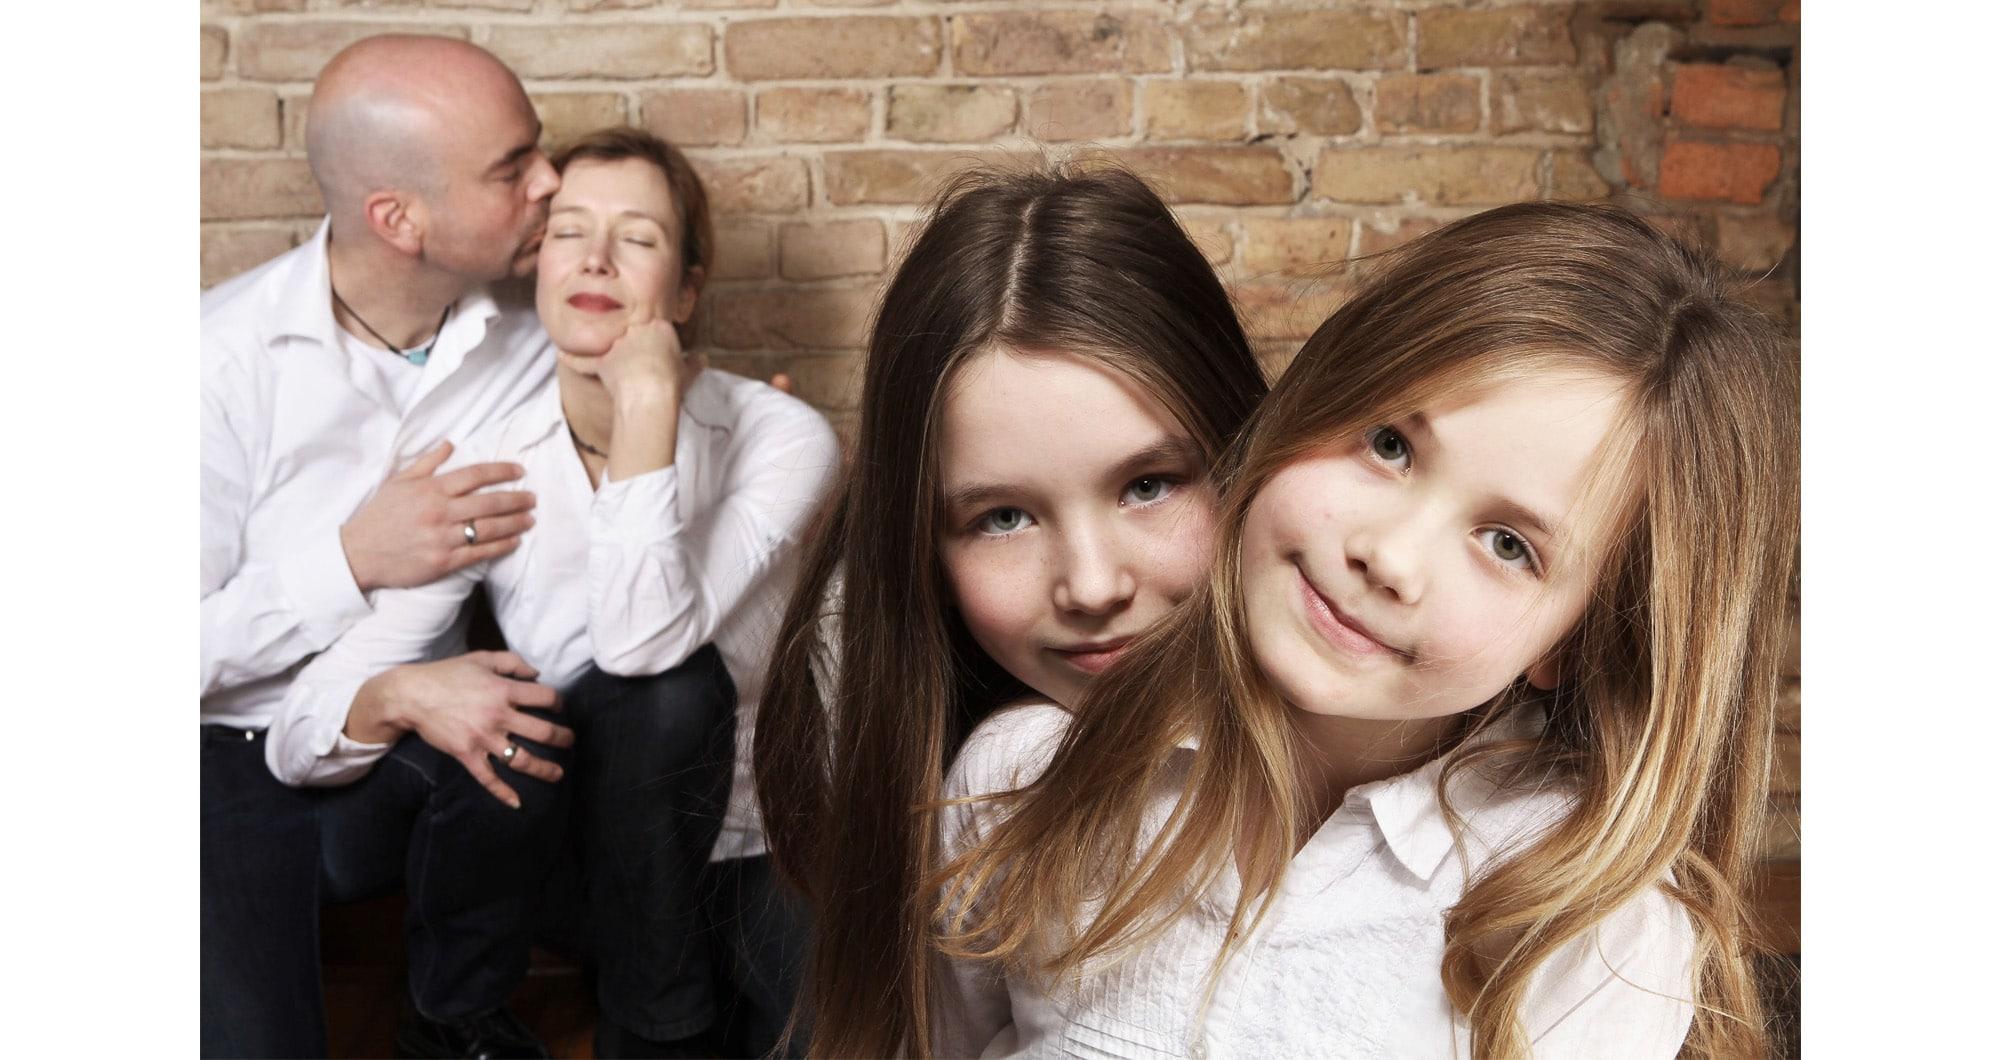 familieundkinderfoto-lenzvonkolkow-fotografie38